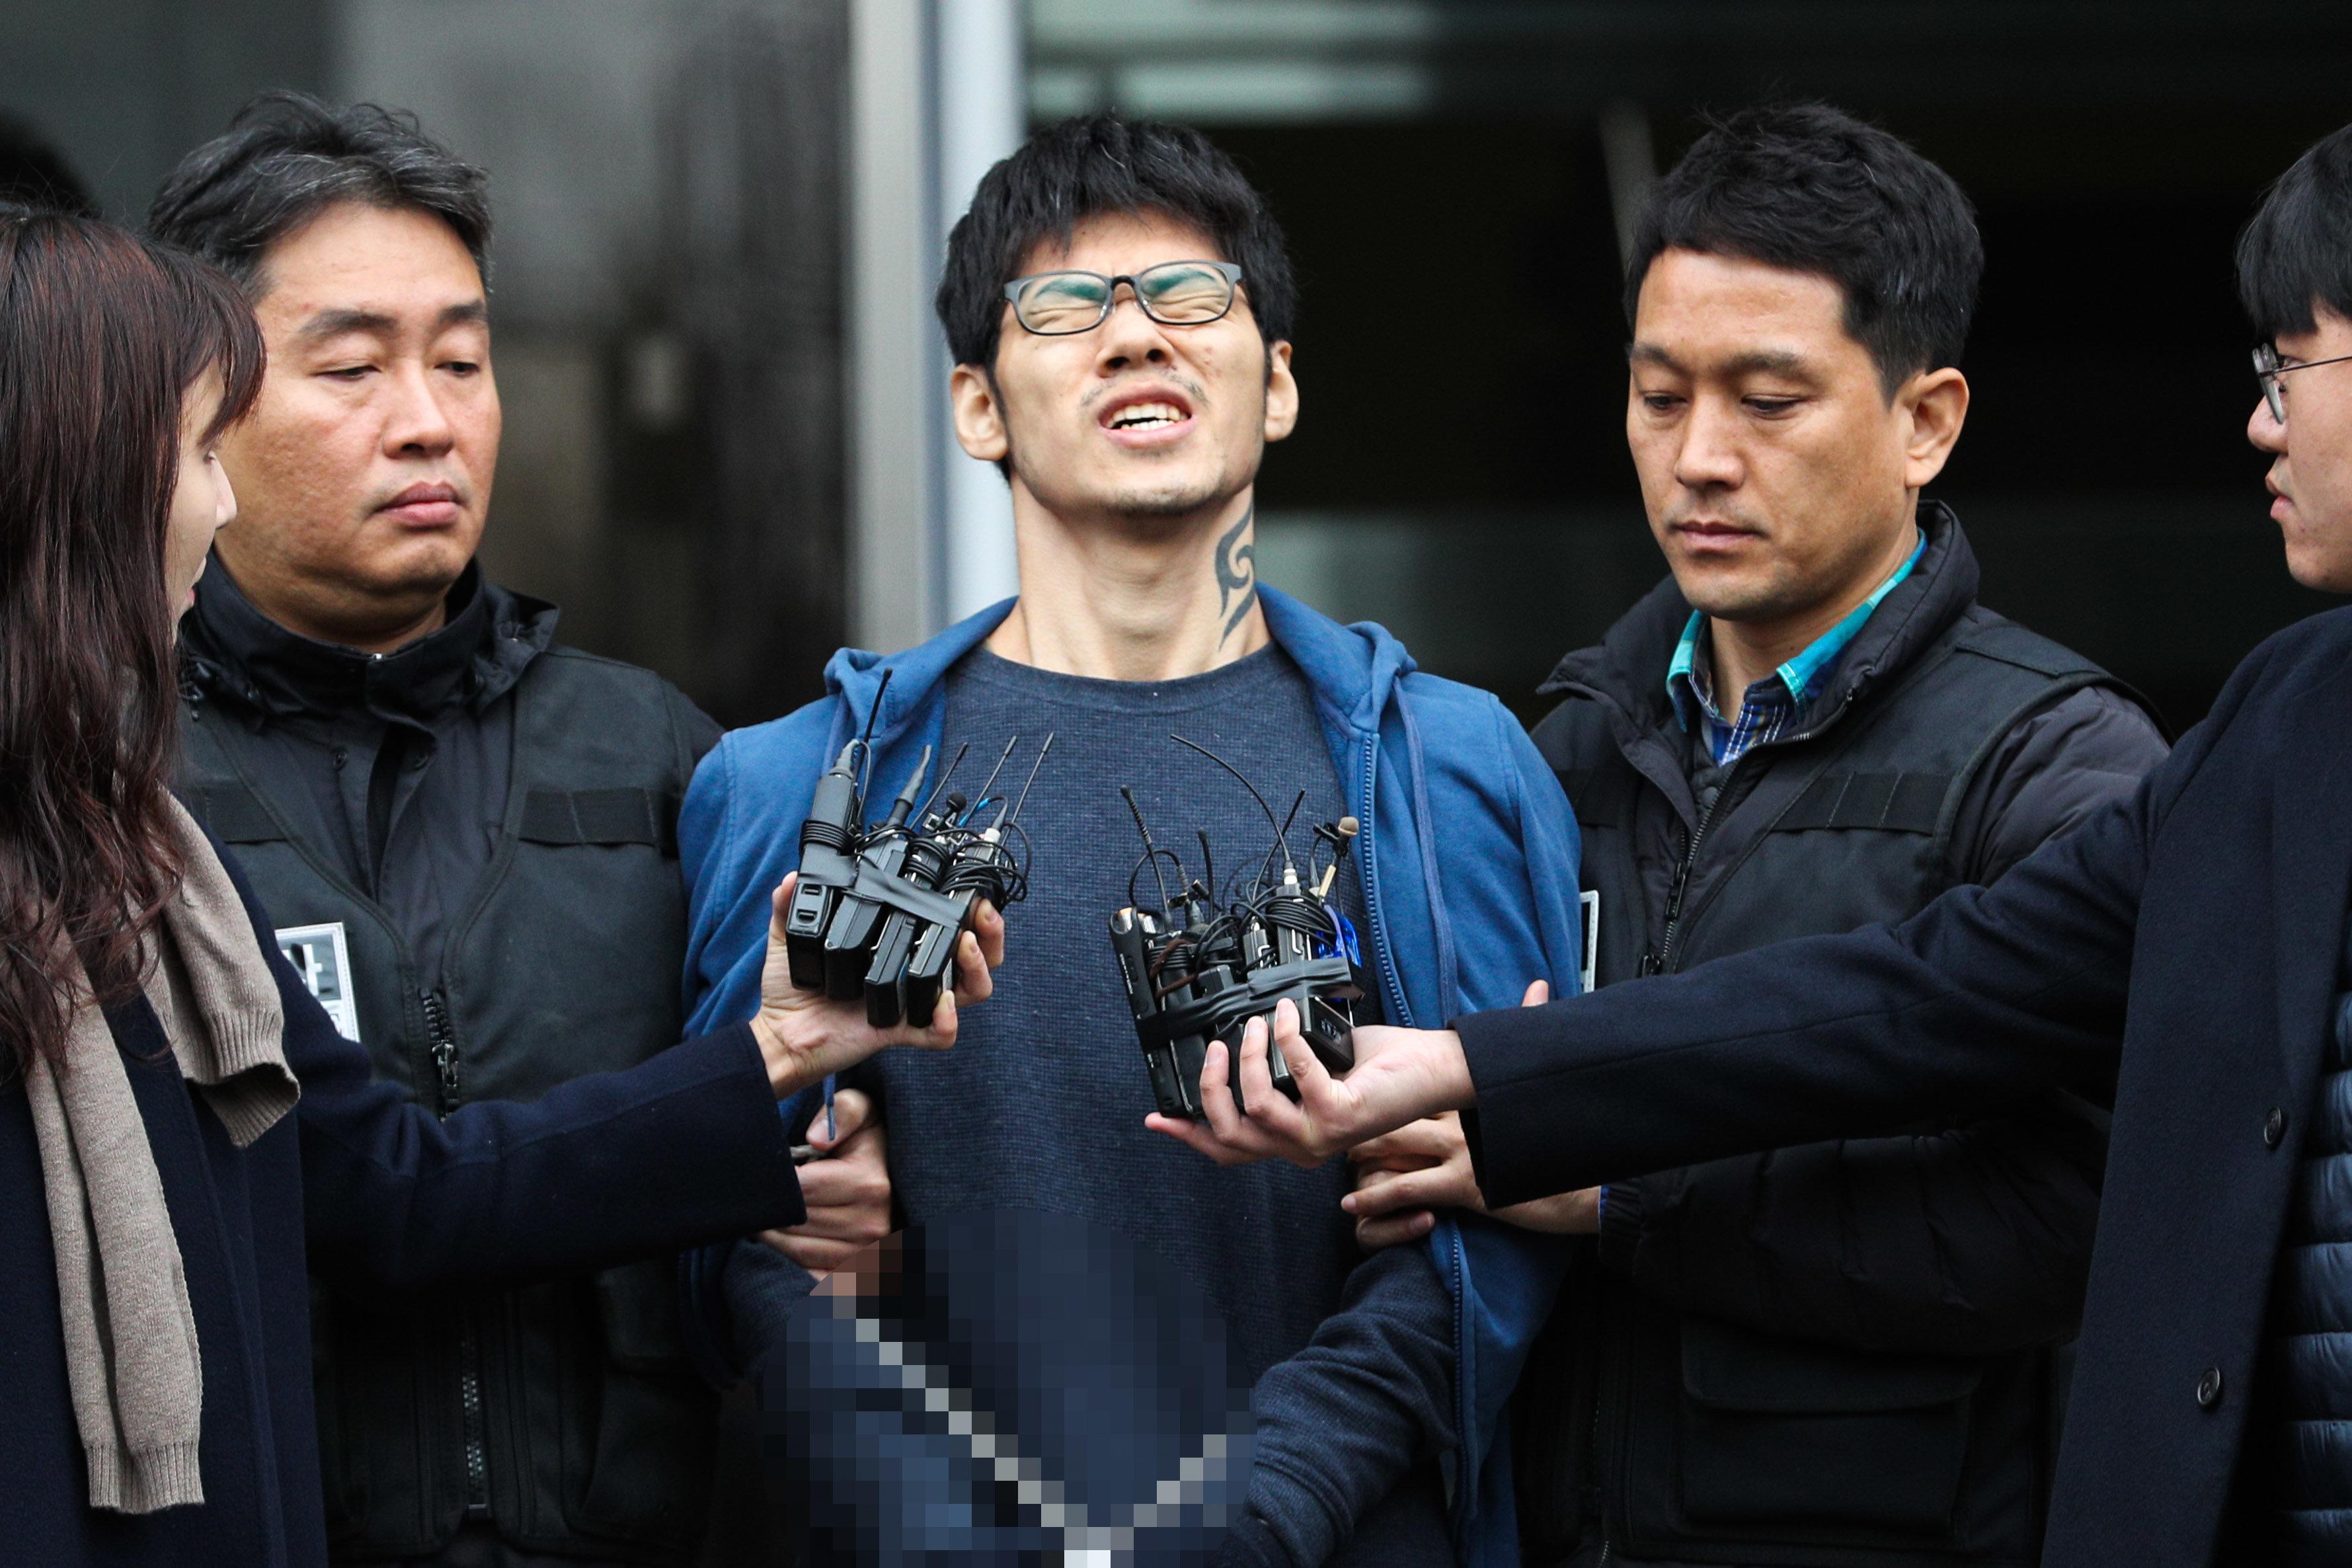 'PC방 살인사건' 피의자 김성수가 동생 공범 의혹과 심신미약 감정 결과에 대해 한